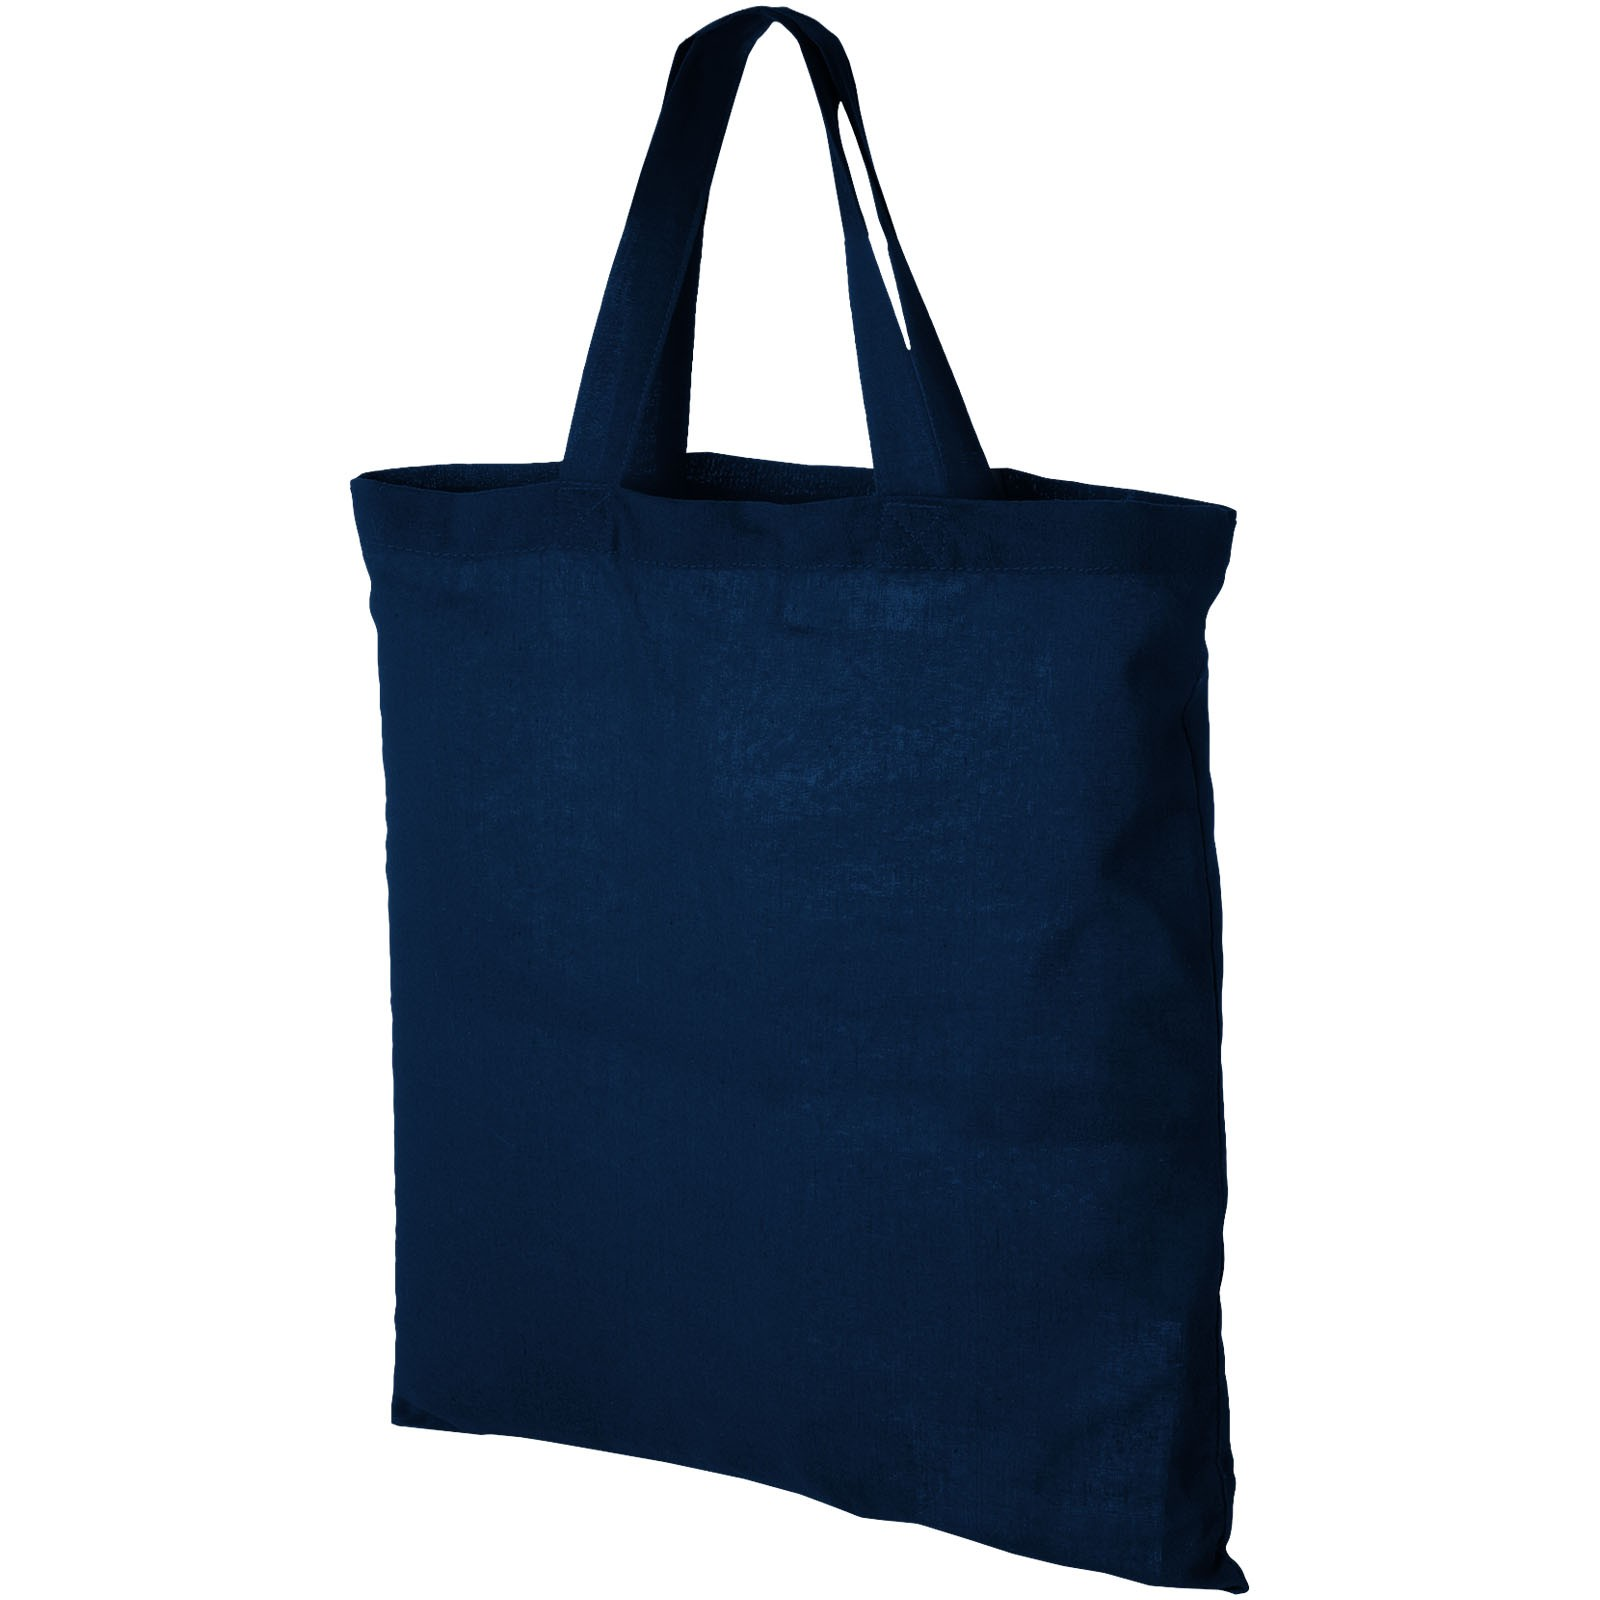 Virginia 100 g/m² cotton tote bag short handles - Navy